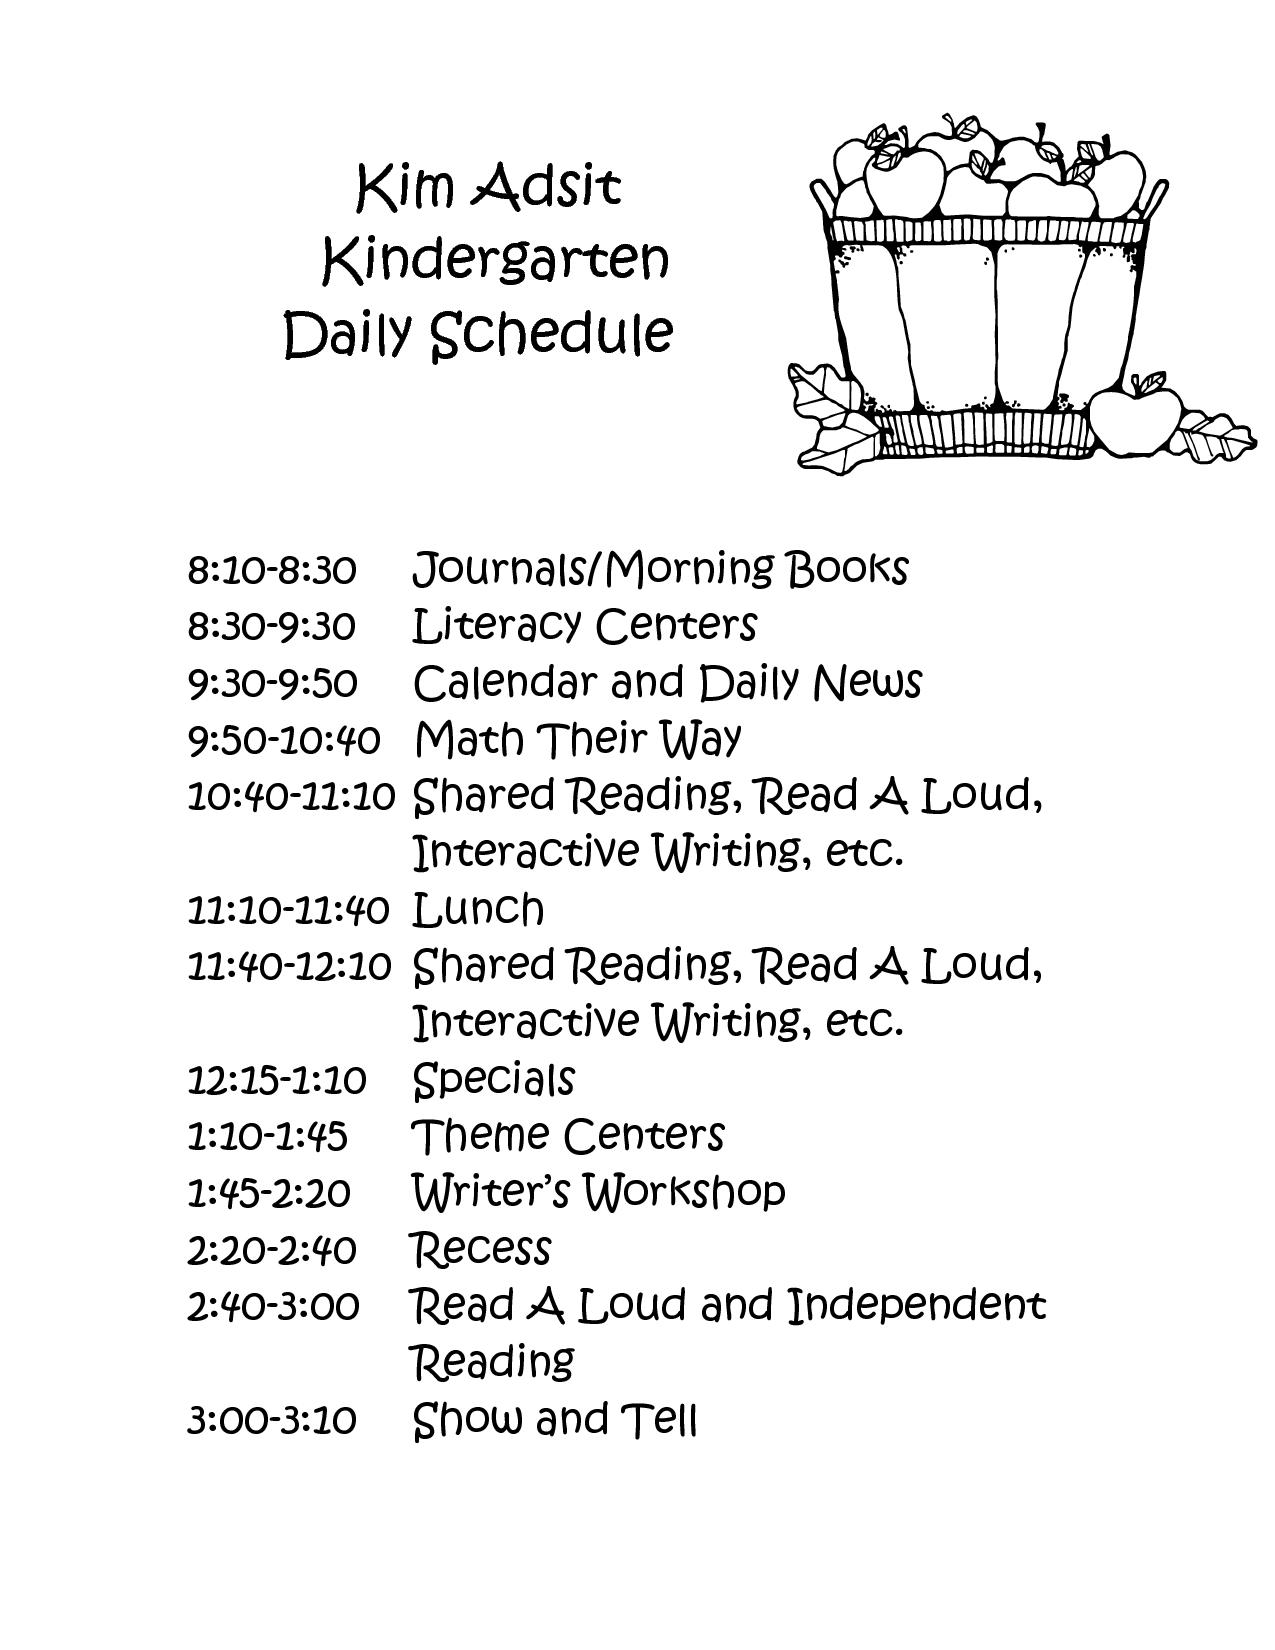 Full Day Kindergarten Class Schedule  Kim Adsit Kindergarten